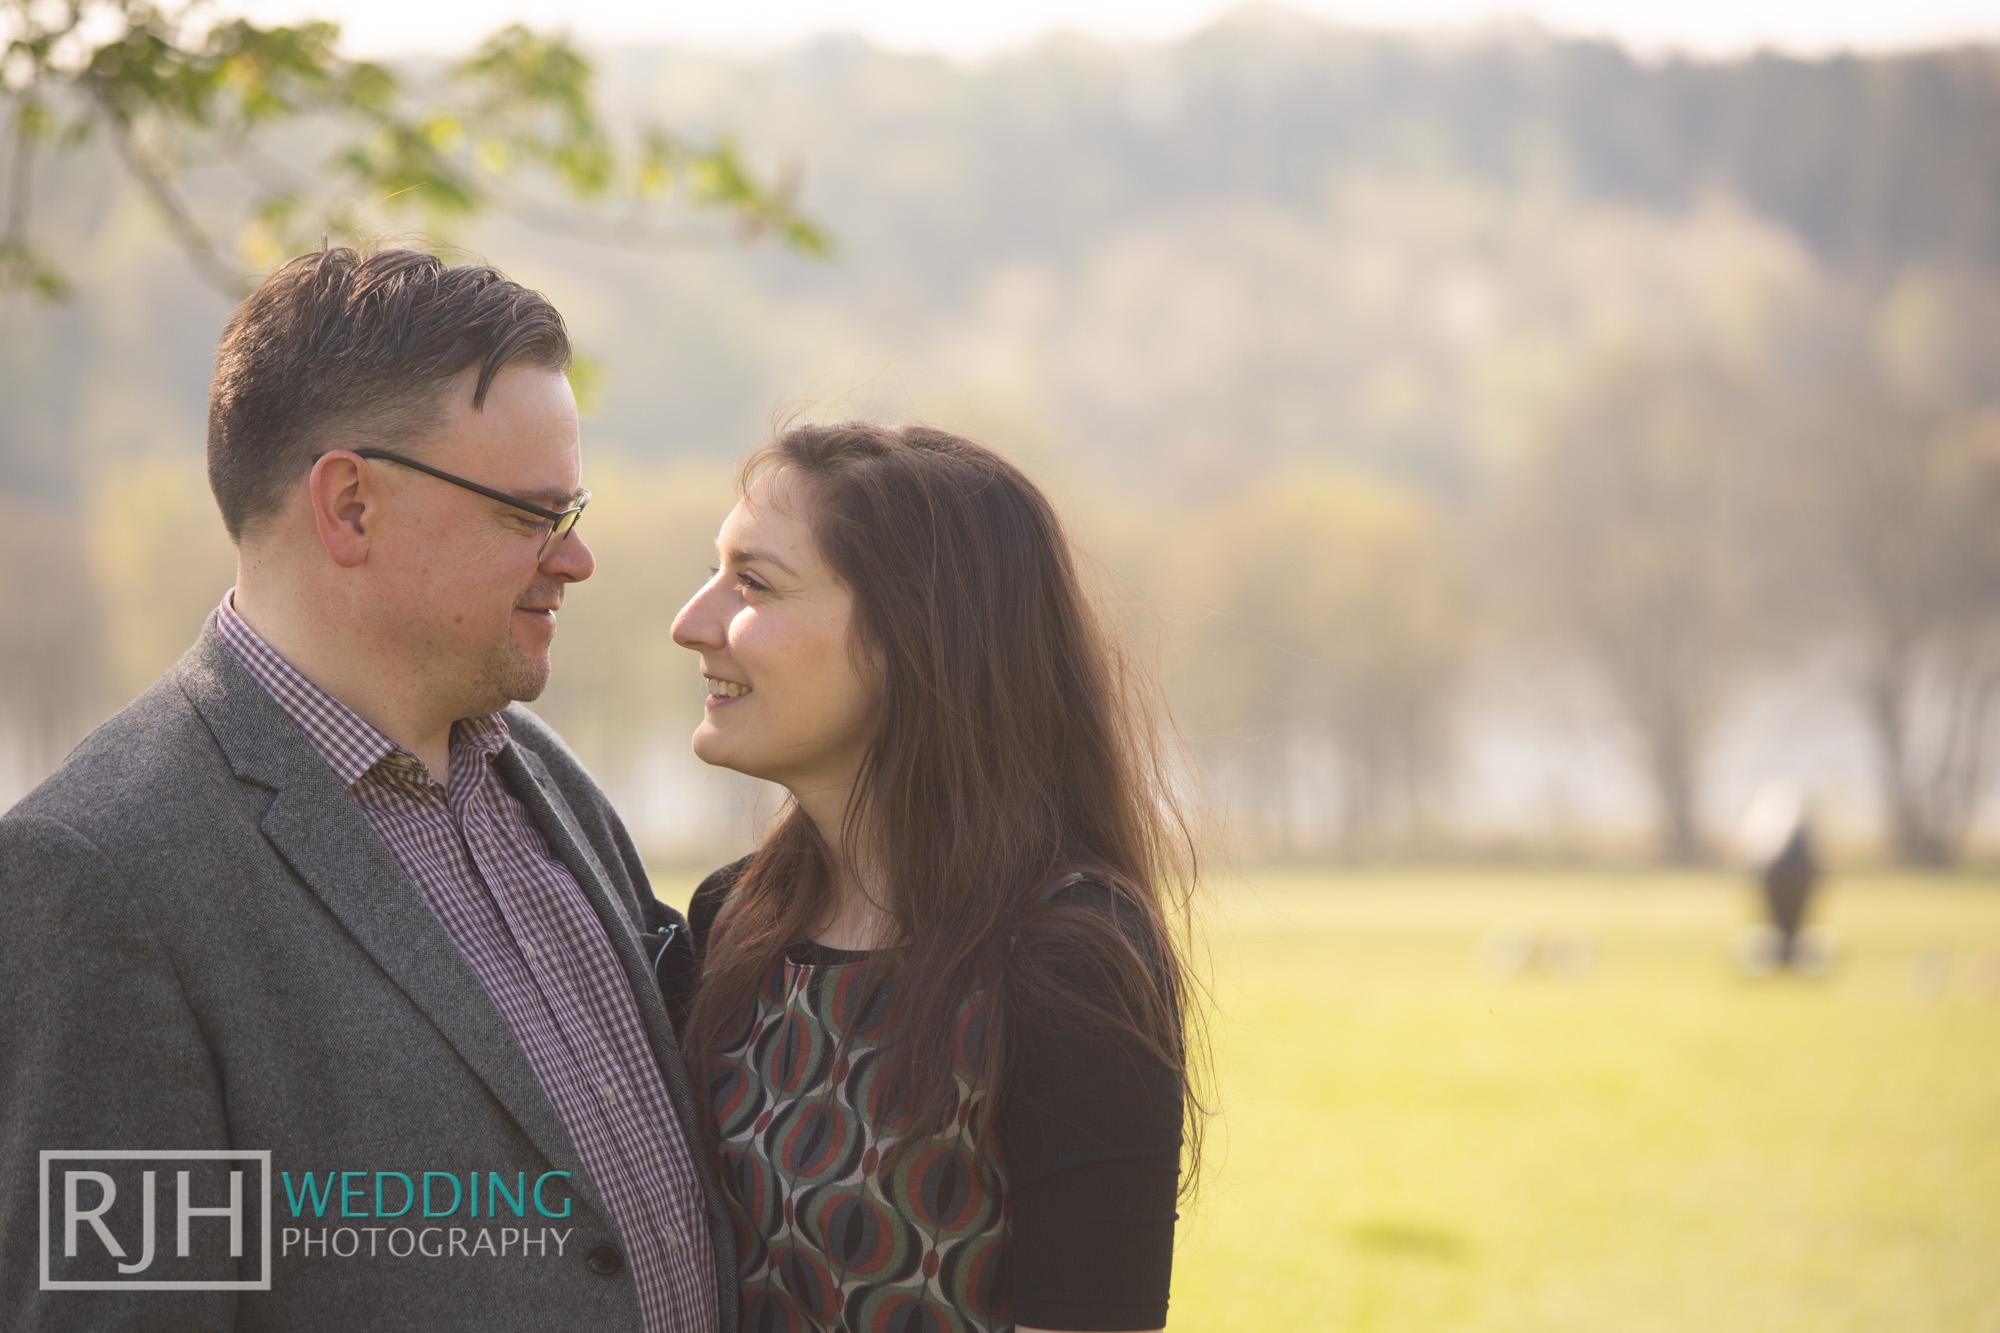 Pre-wedding photography - Richard & Rachel_005_3C2A8124.jpg